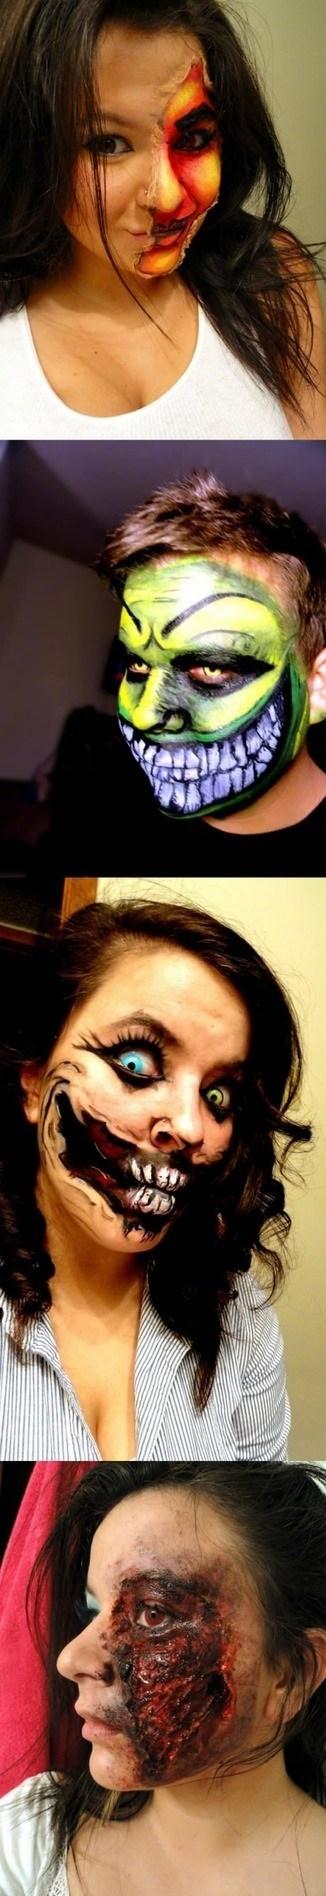 halloween costume face paint - 6720650752